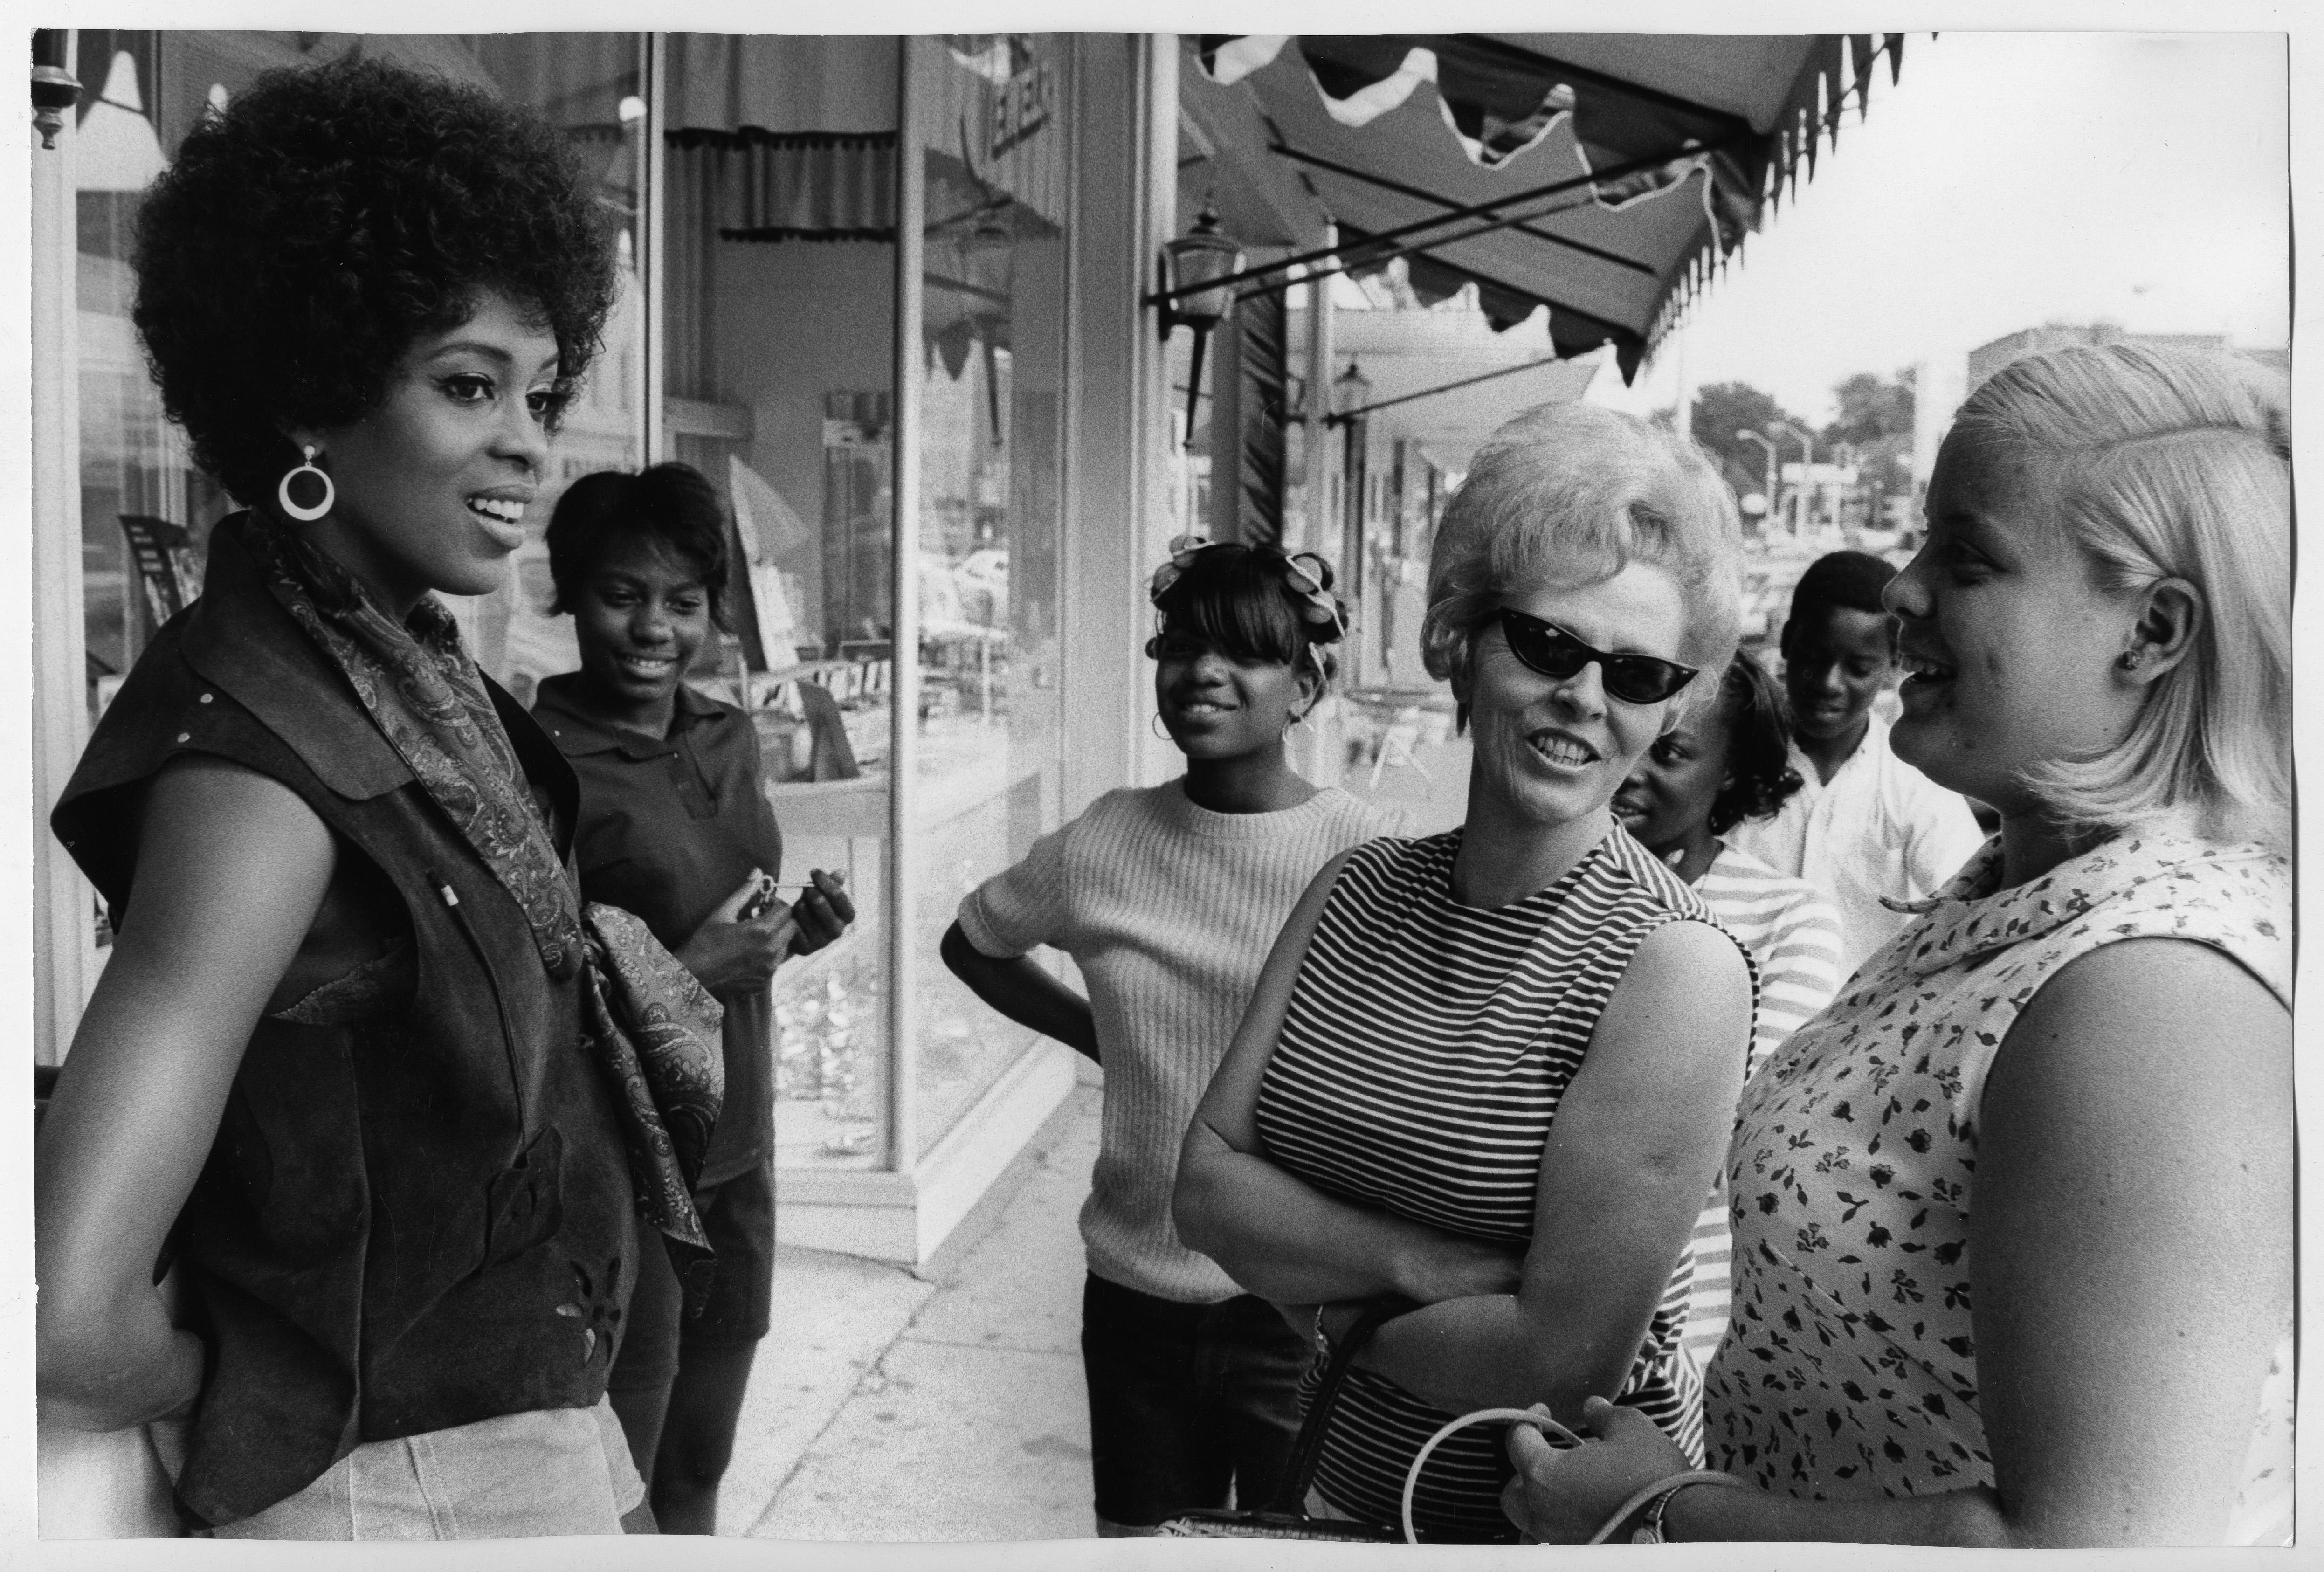 Lola Falana with women on the street photographed by Frank Dandridge, 1969.